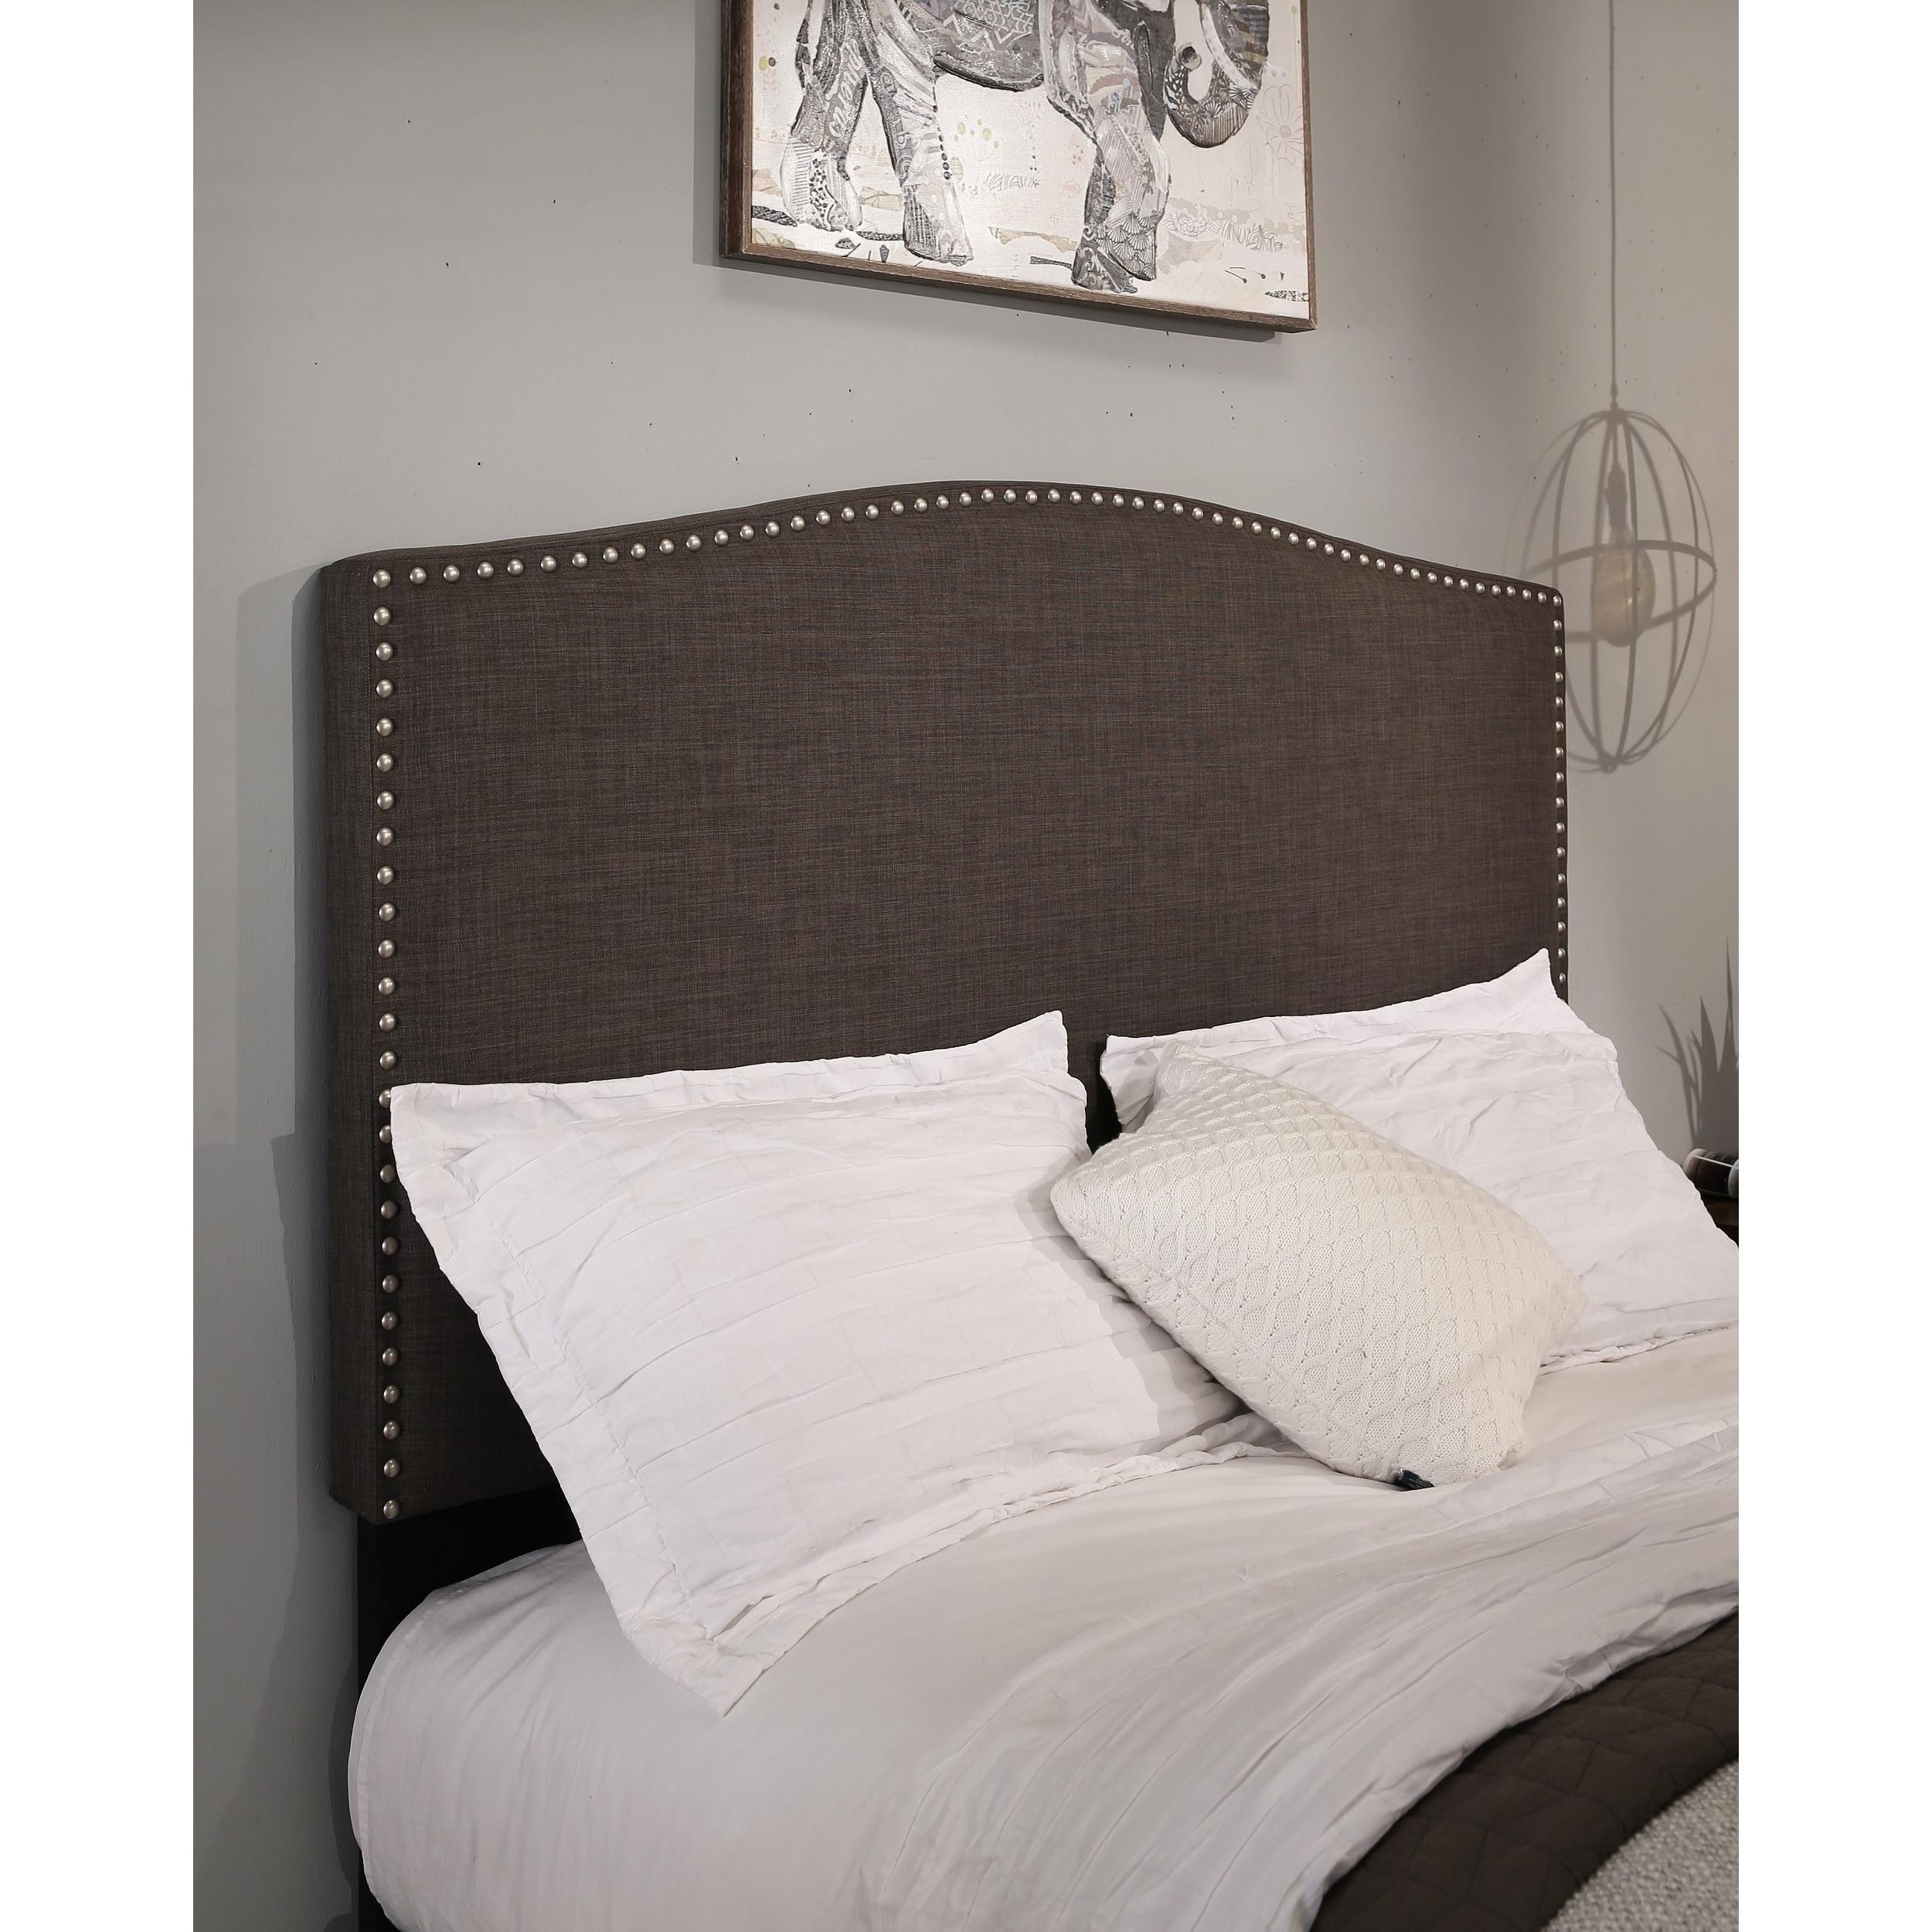 sweet full wayfair sealy mattress great slipcover king tufted velvet grey size headboards headboard bed queen wa